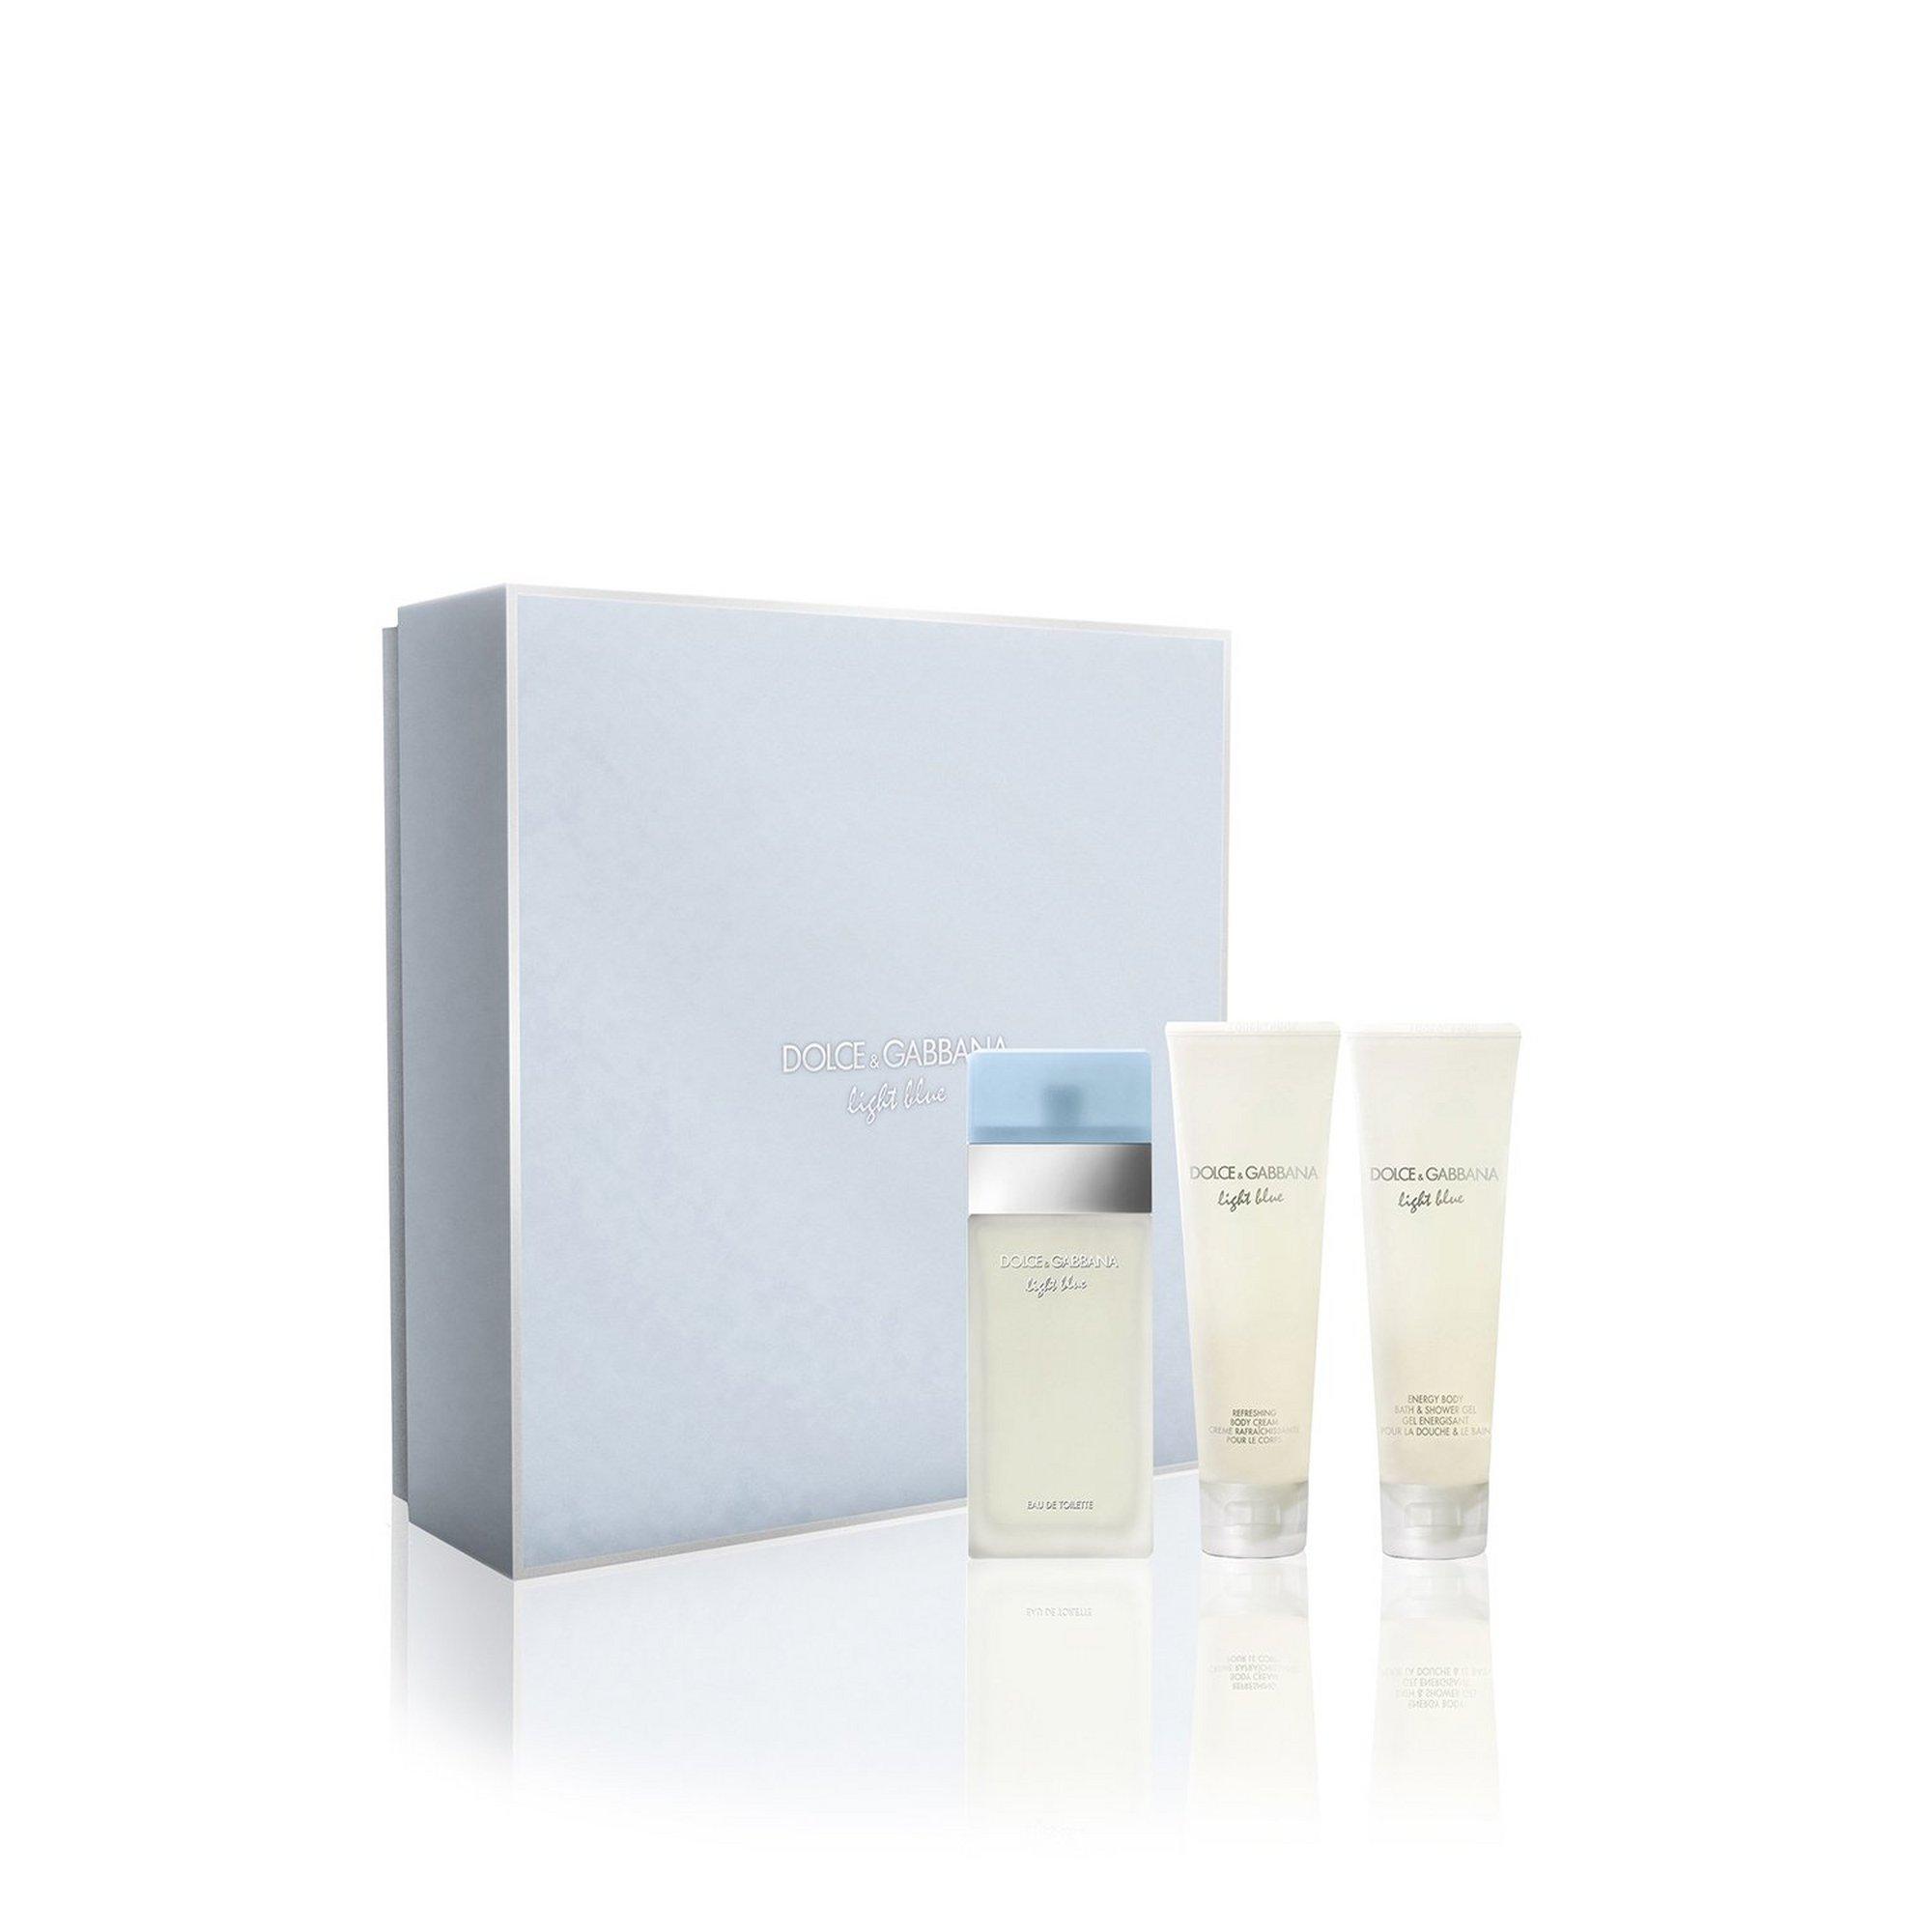 Image of Dolce and Gabbana Light Blue 50ml EDT Gift Set